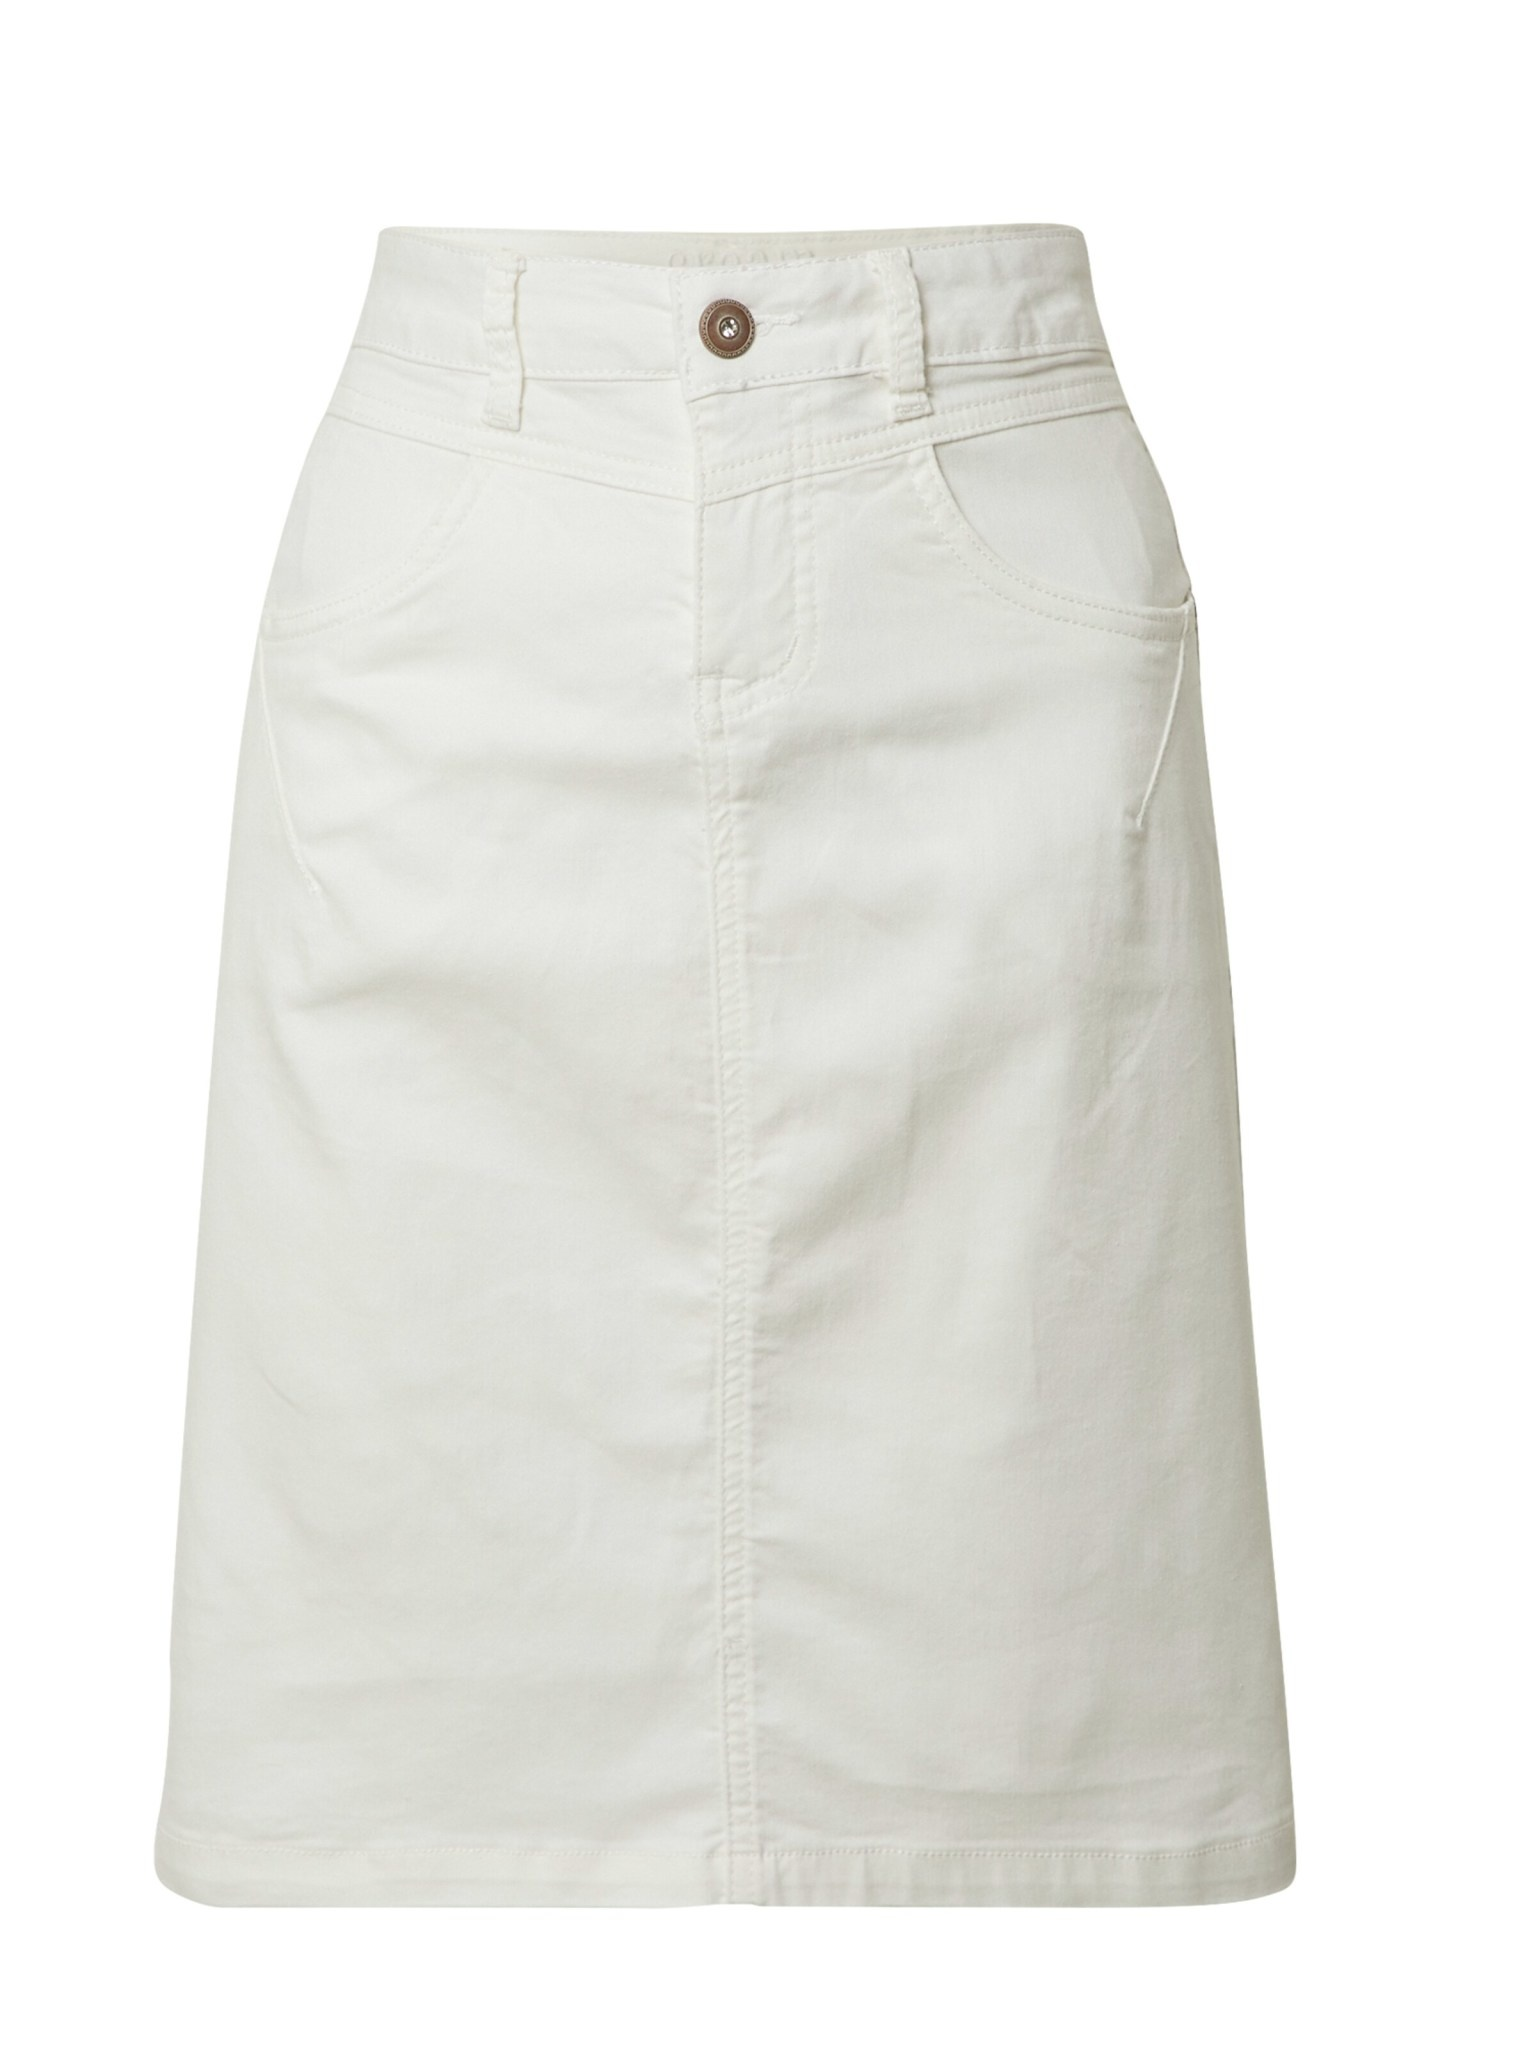 Amalie Skirt - Snow White